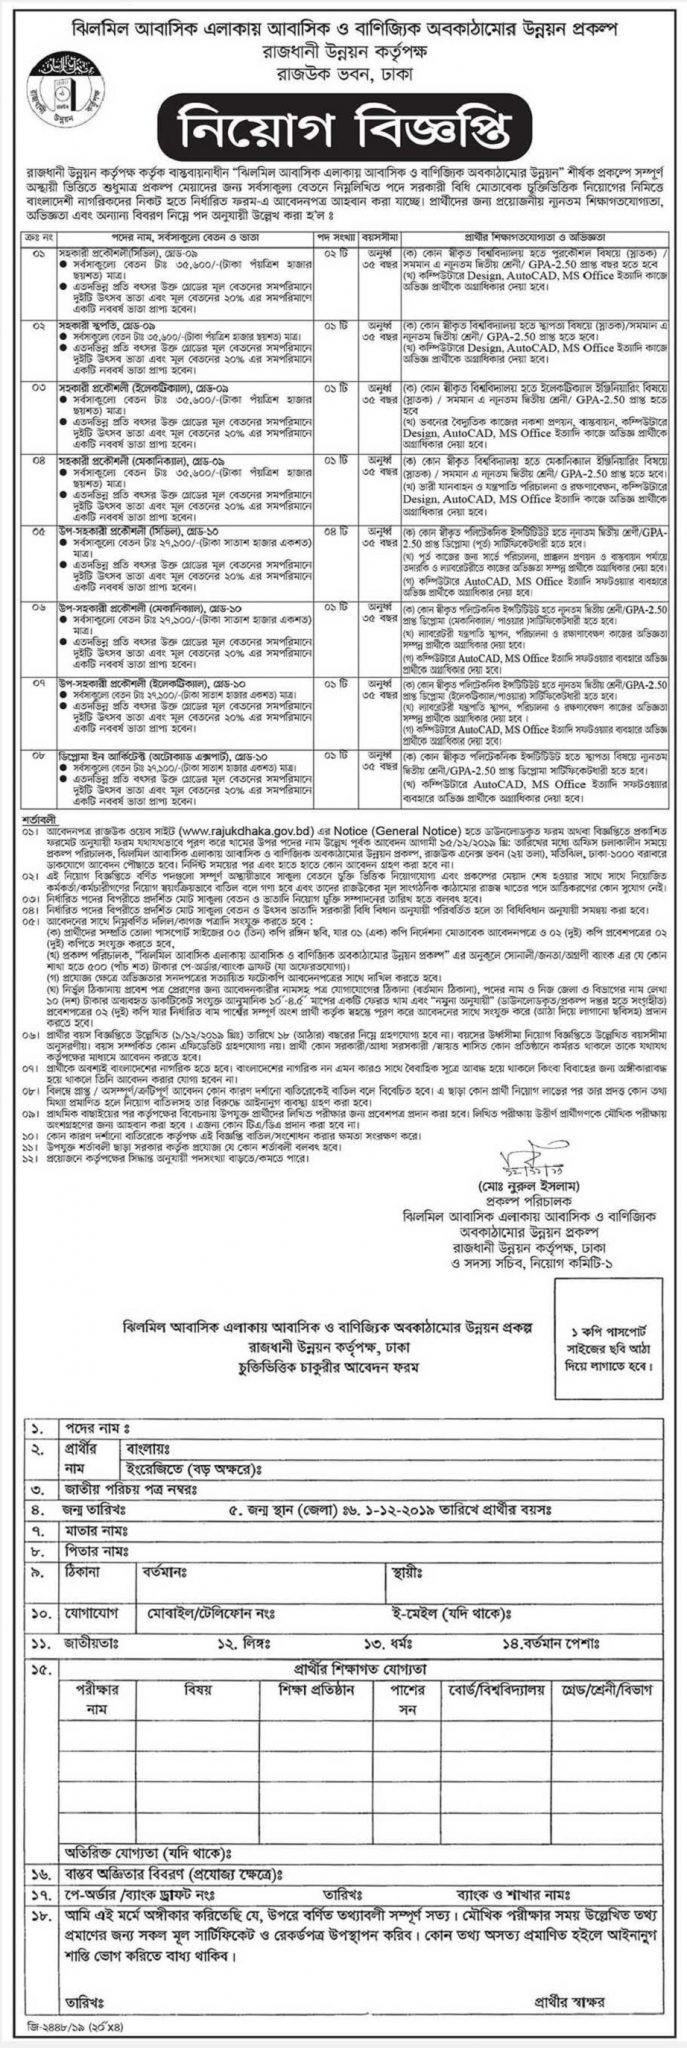 Rajdhani Unnayan Kartripakkha (RAJUK) Job Circular 2019